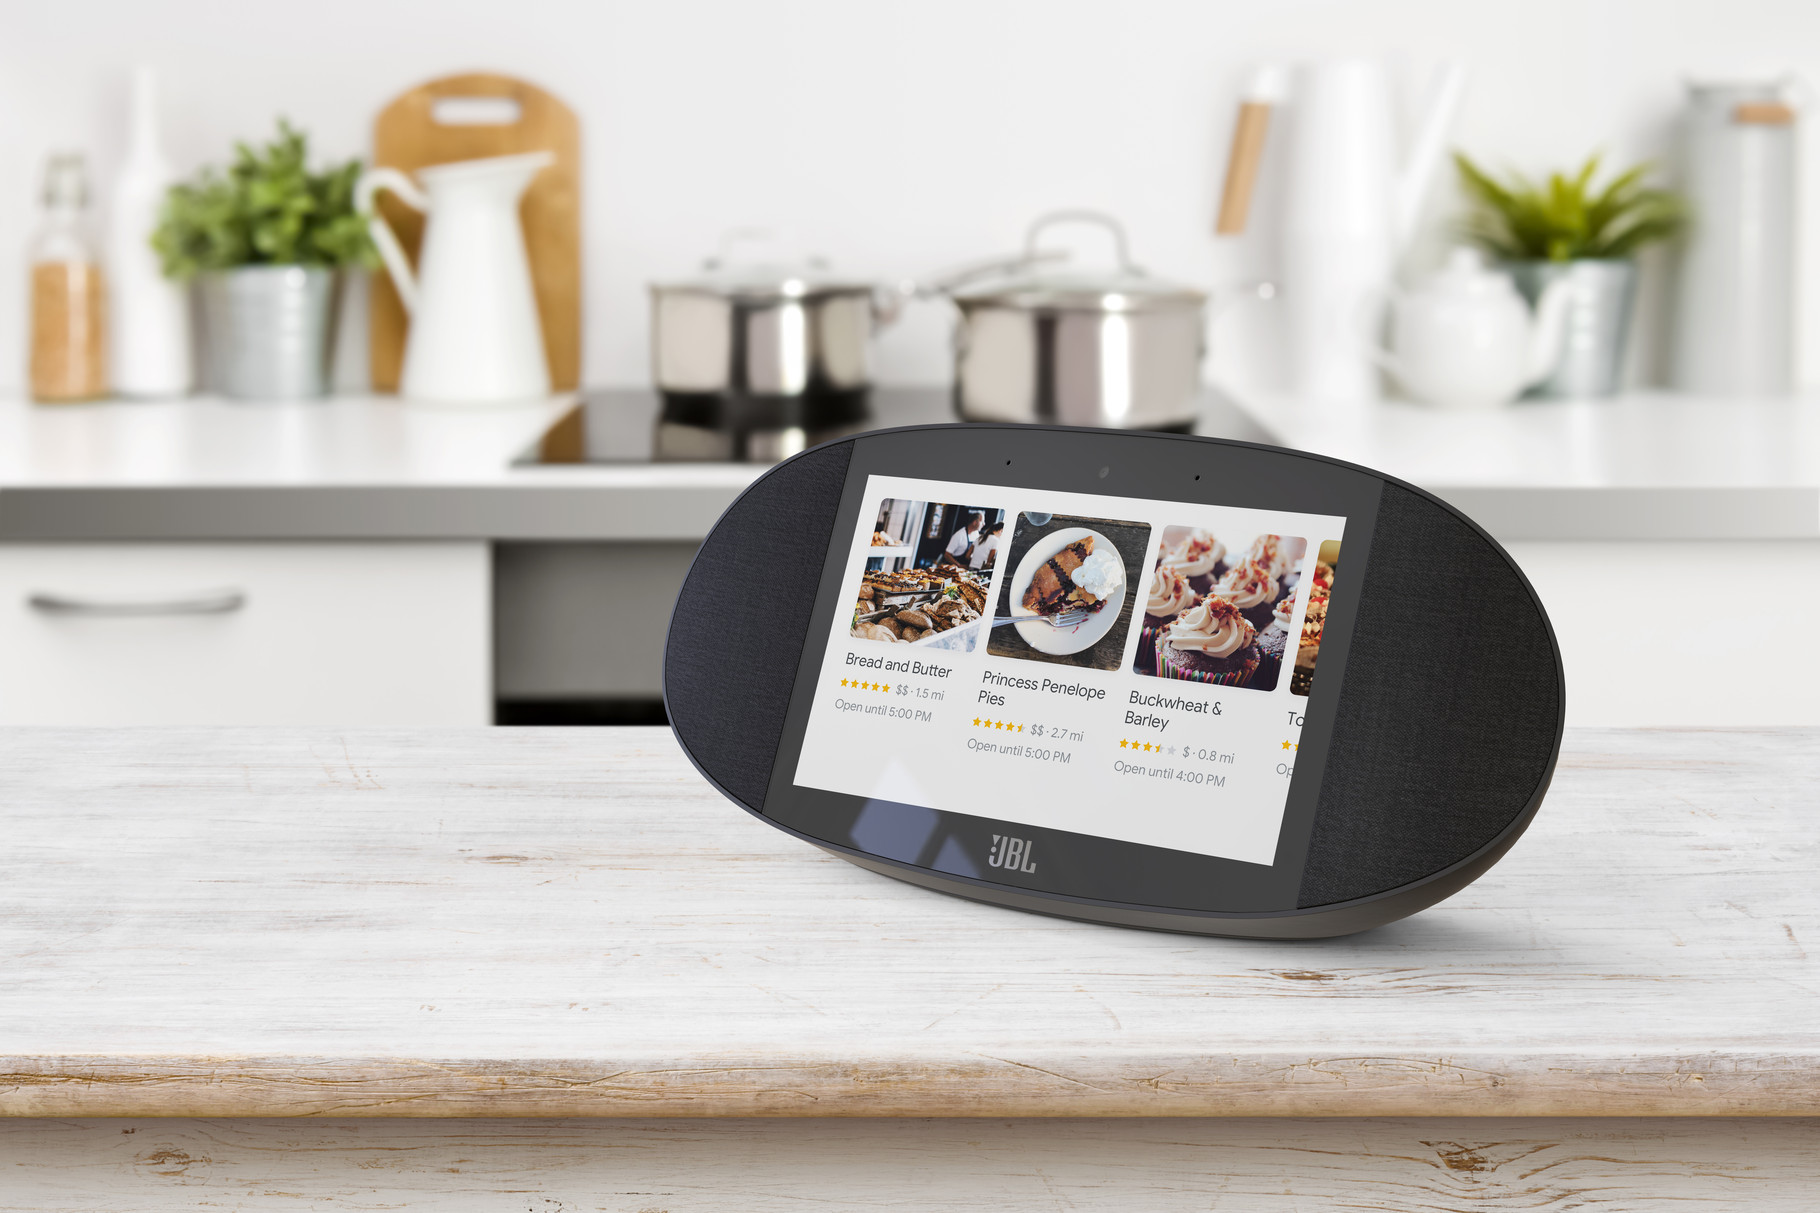 głośnik google asystent smart display